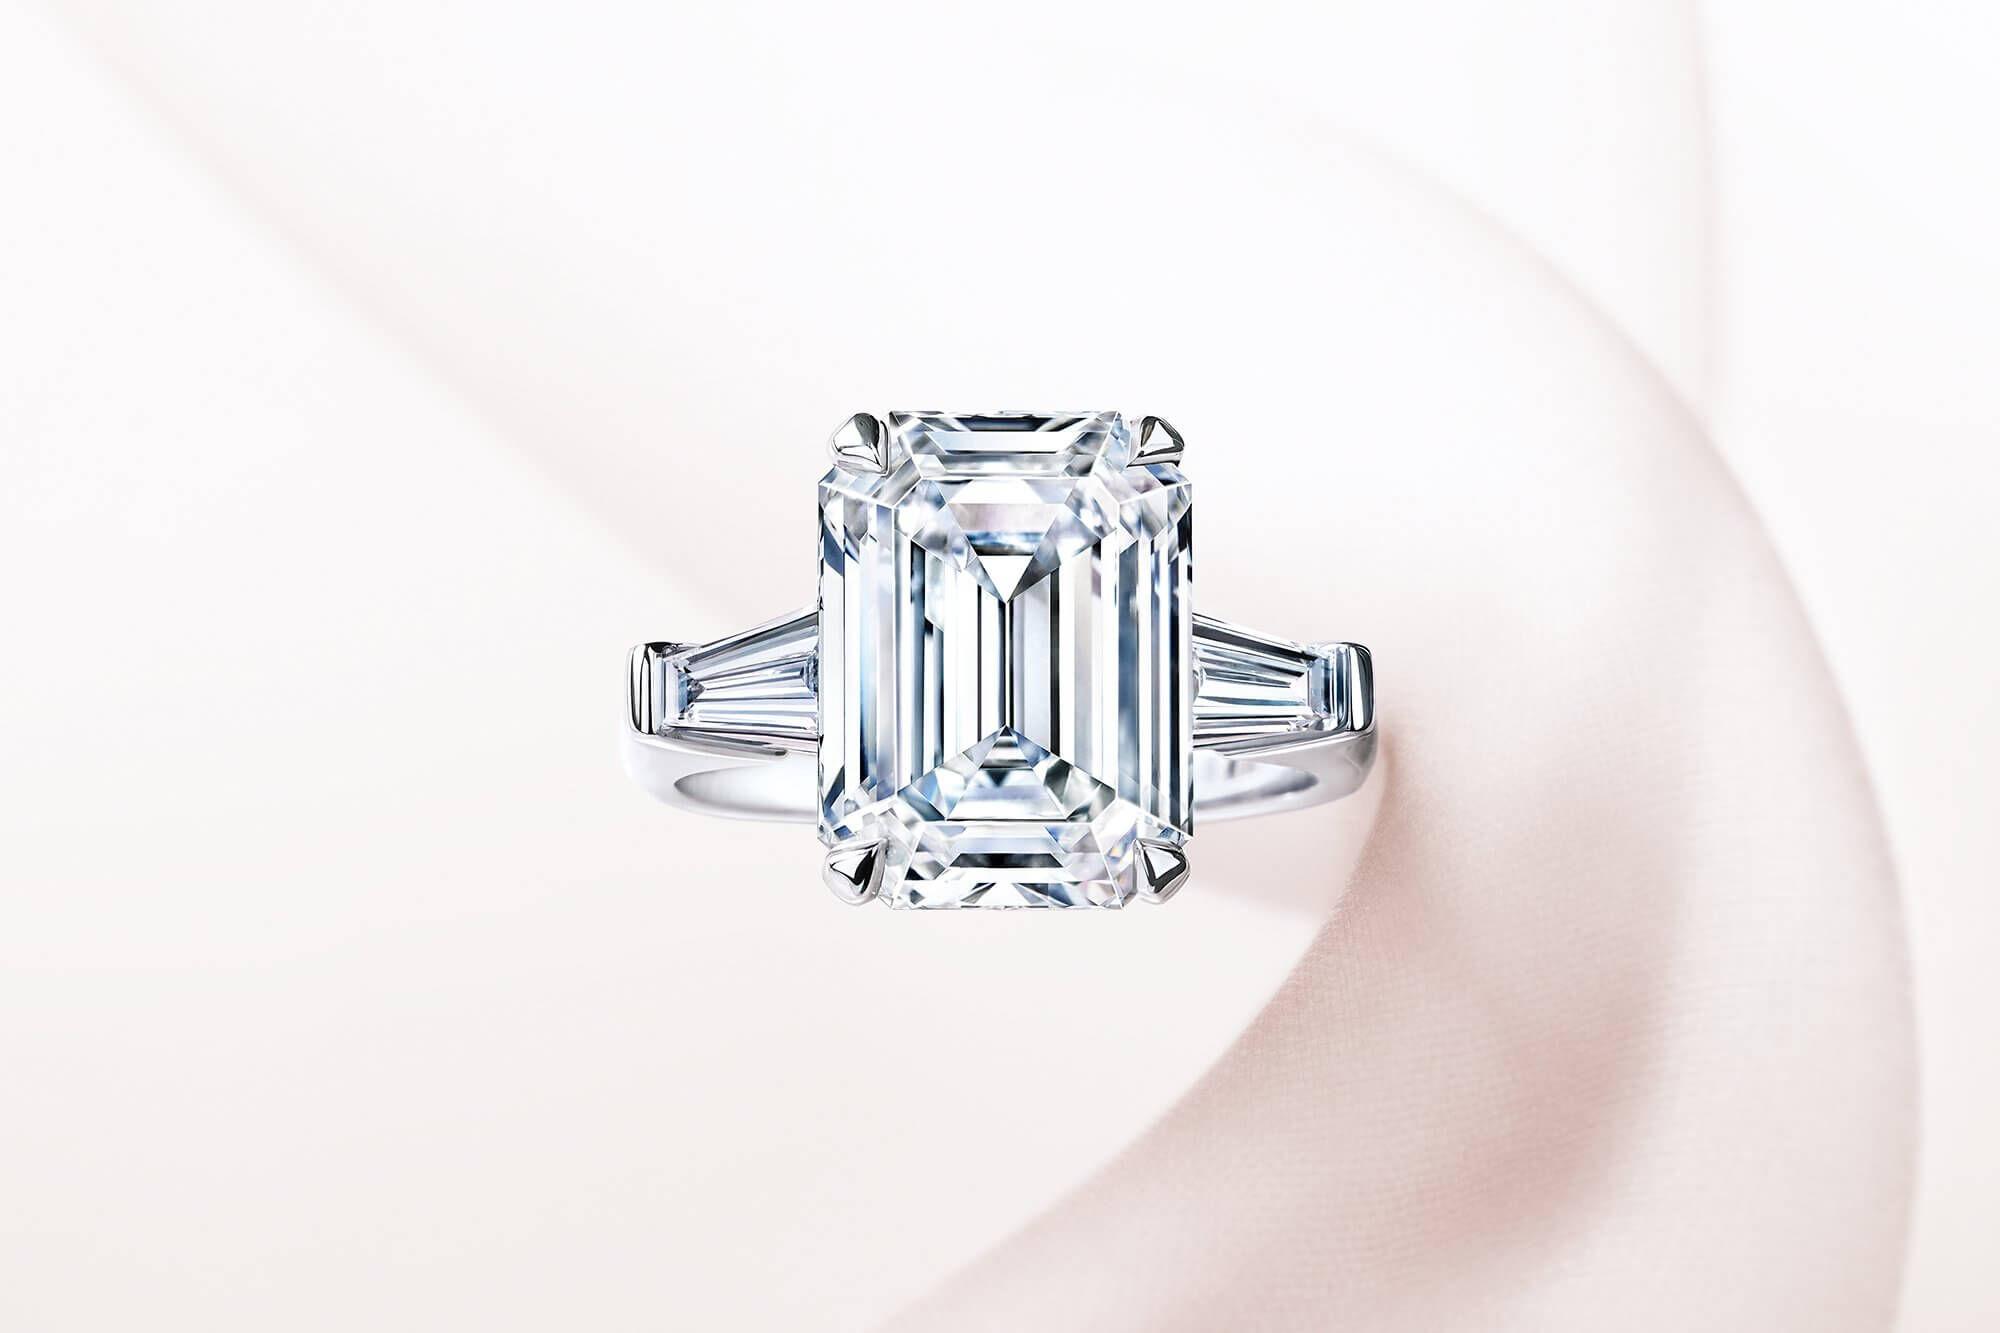 A Graff emerald cut diamond Promise setting engagement ring